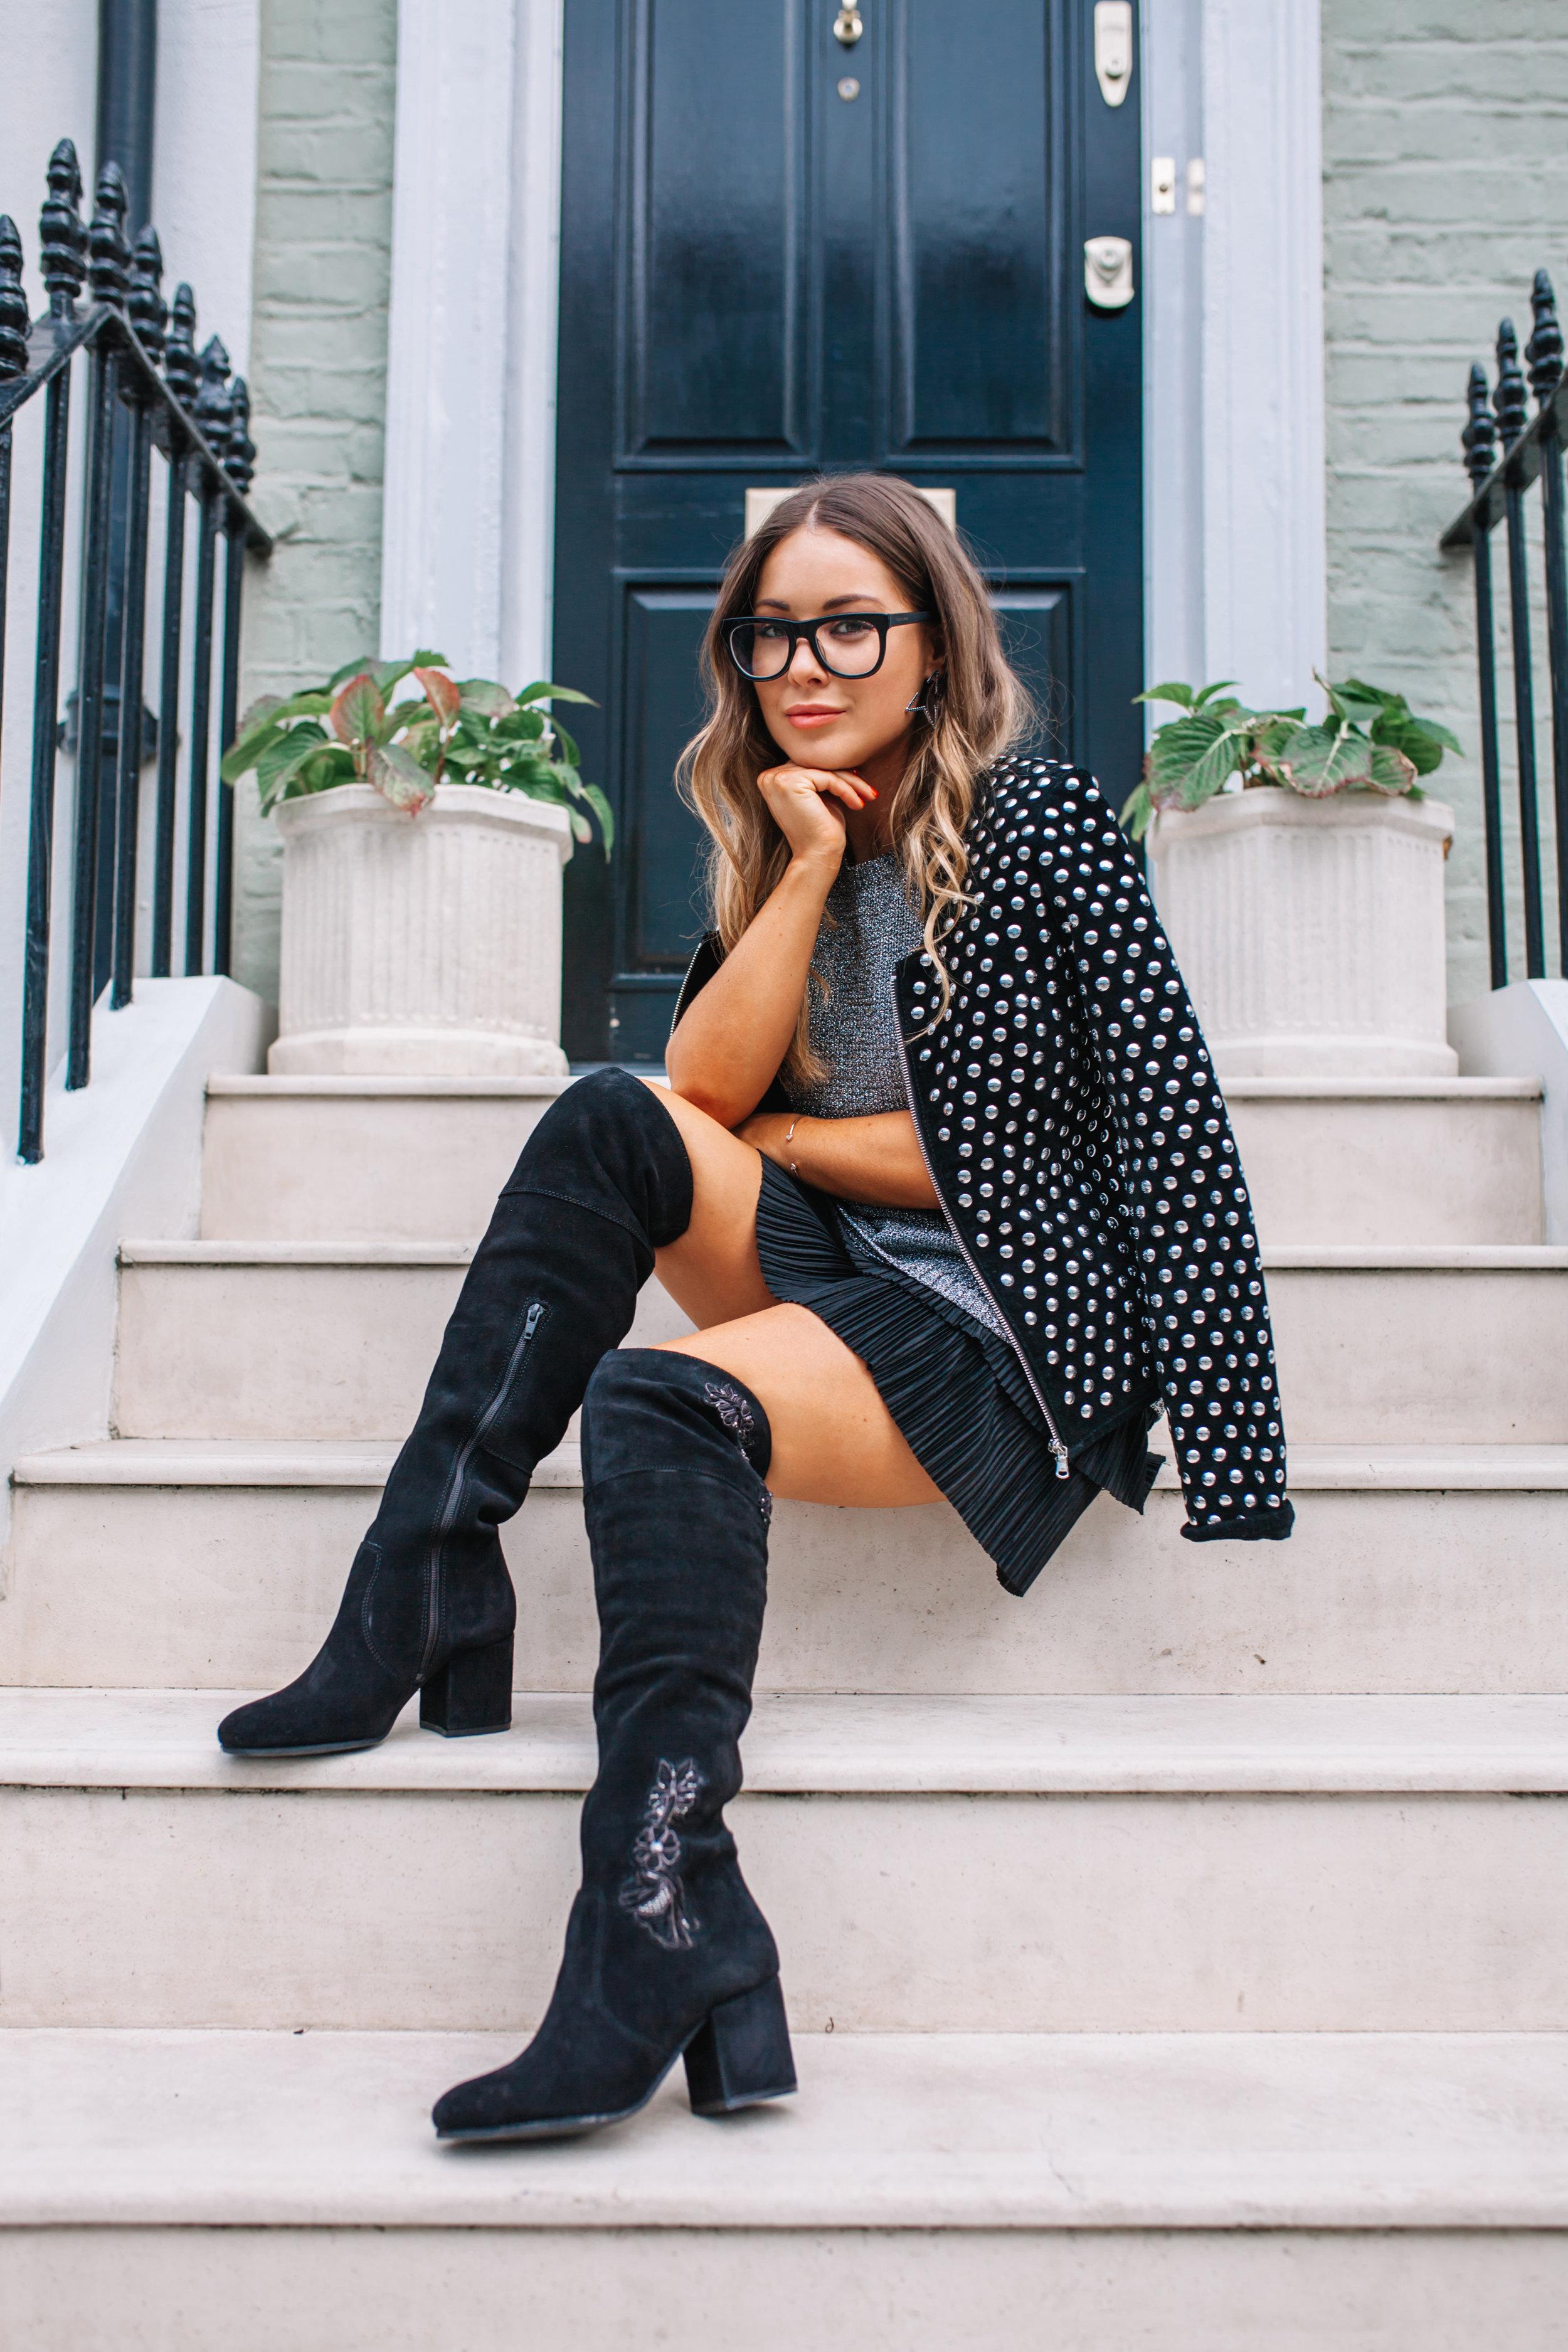 Louise_Thompson_Outfit2_MichaelaEfford.jpg